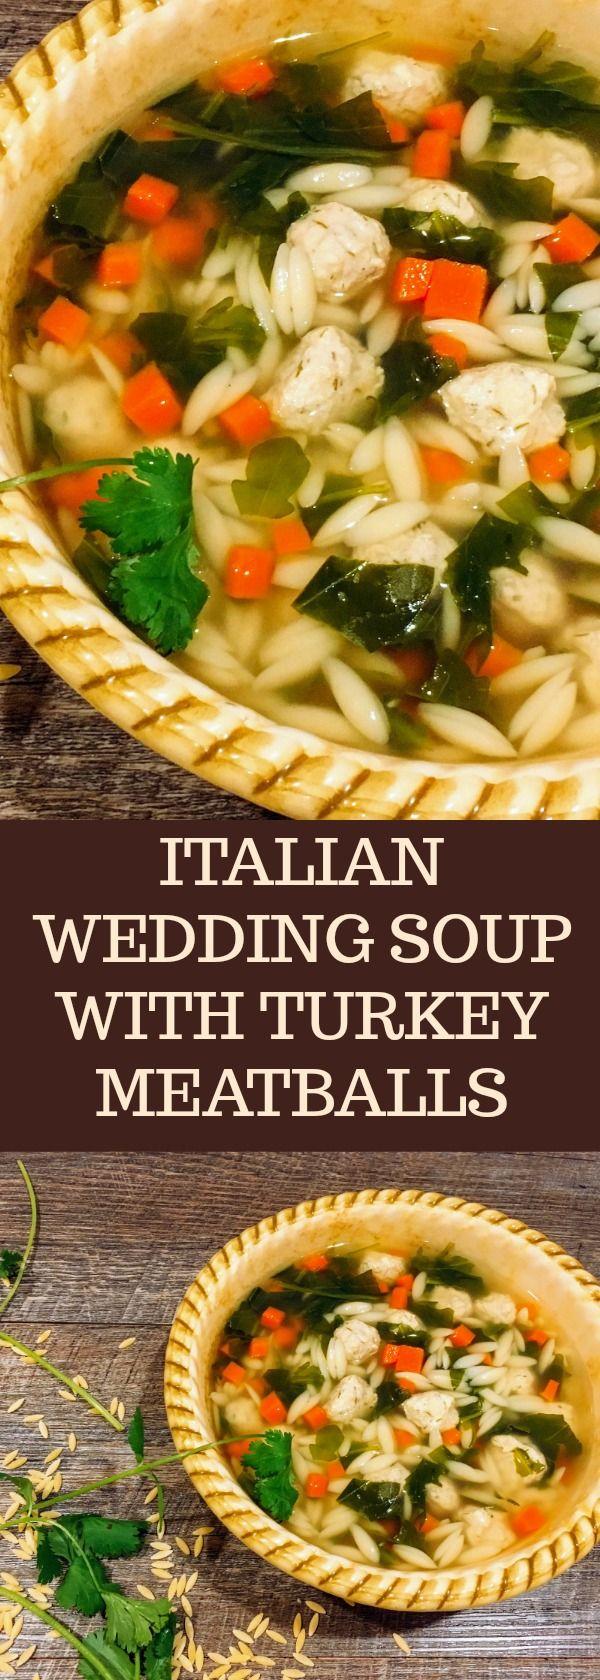 ITALIAN WEDDING SOUP WITH TURKEY MEATBALLS Italian